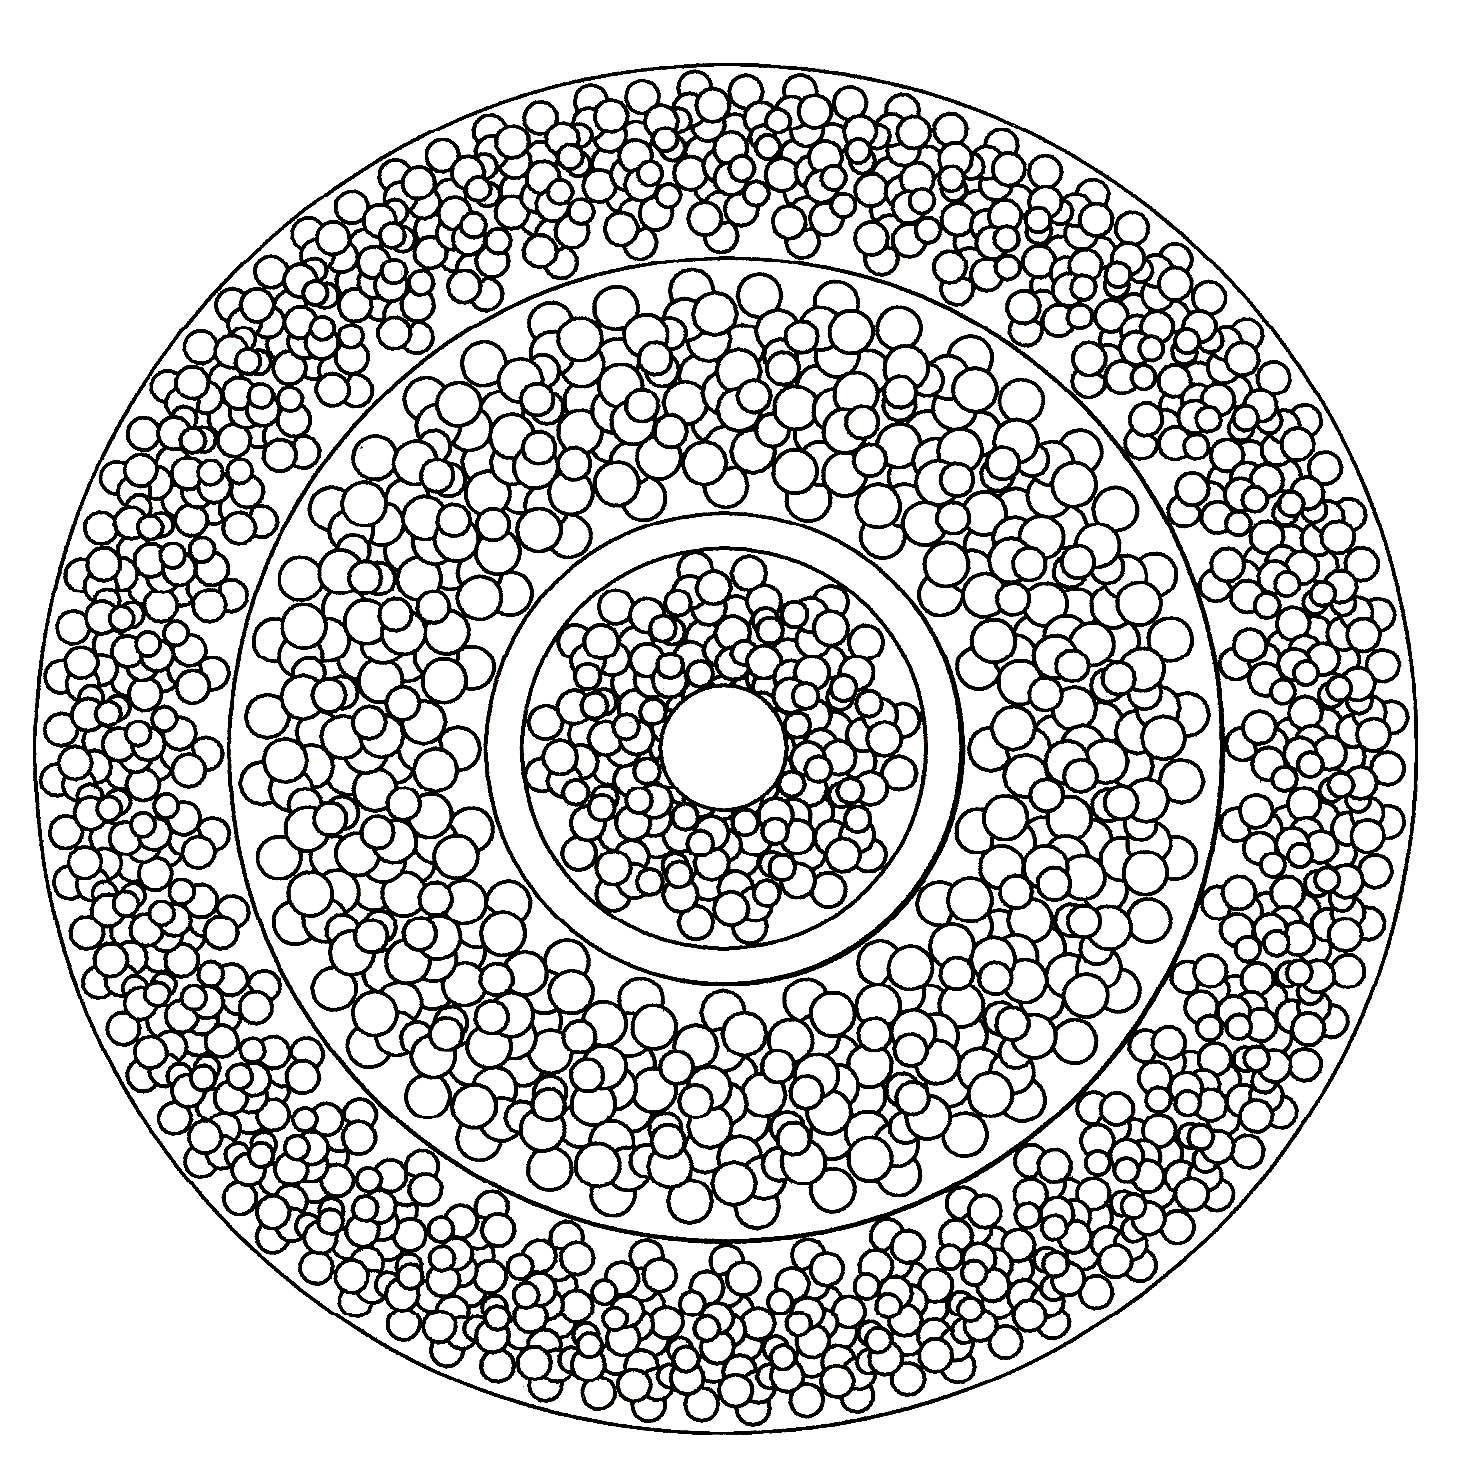 Simple Mandala 3 Simple Mandalas 100 Mandalas Zen